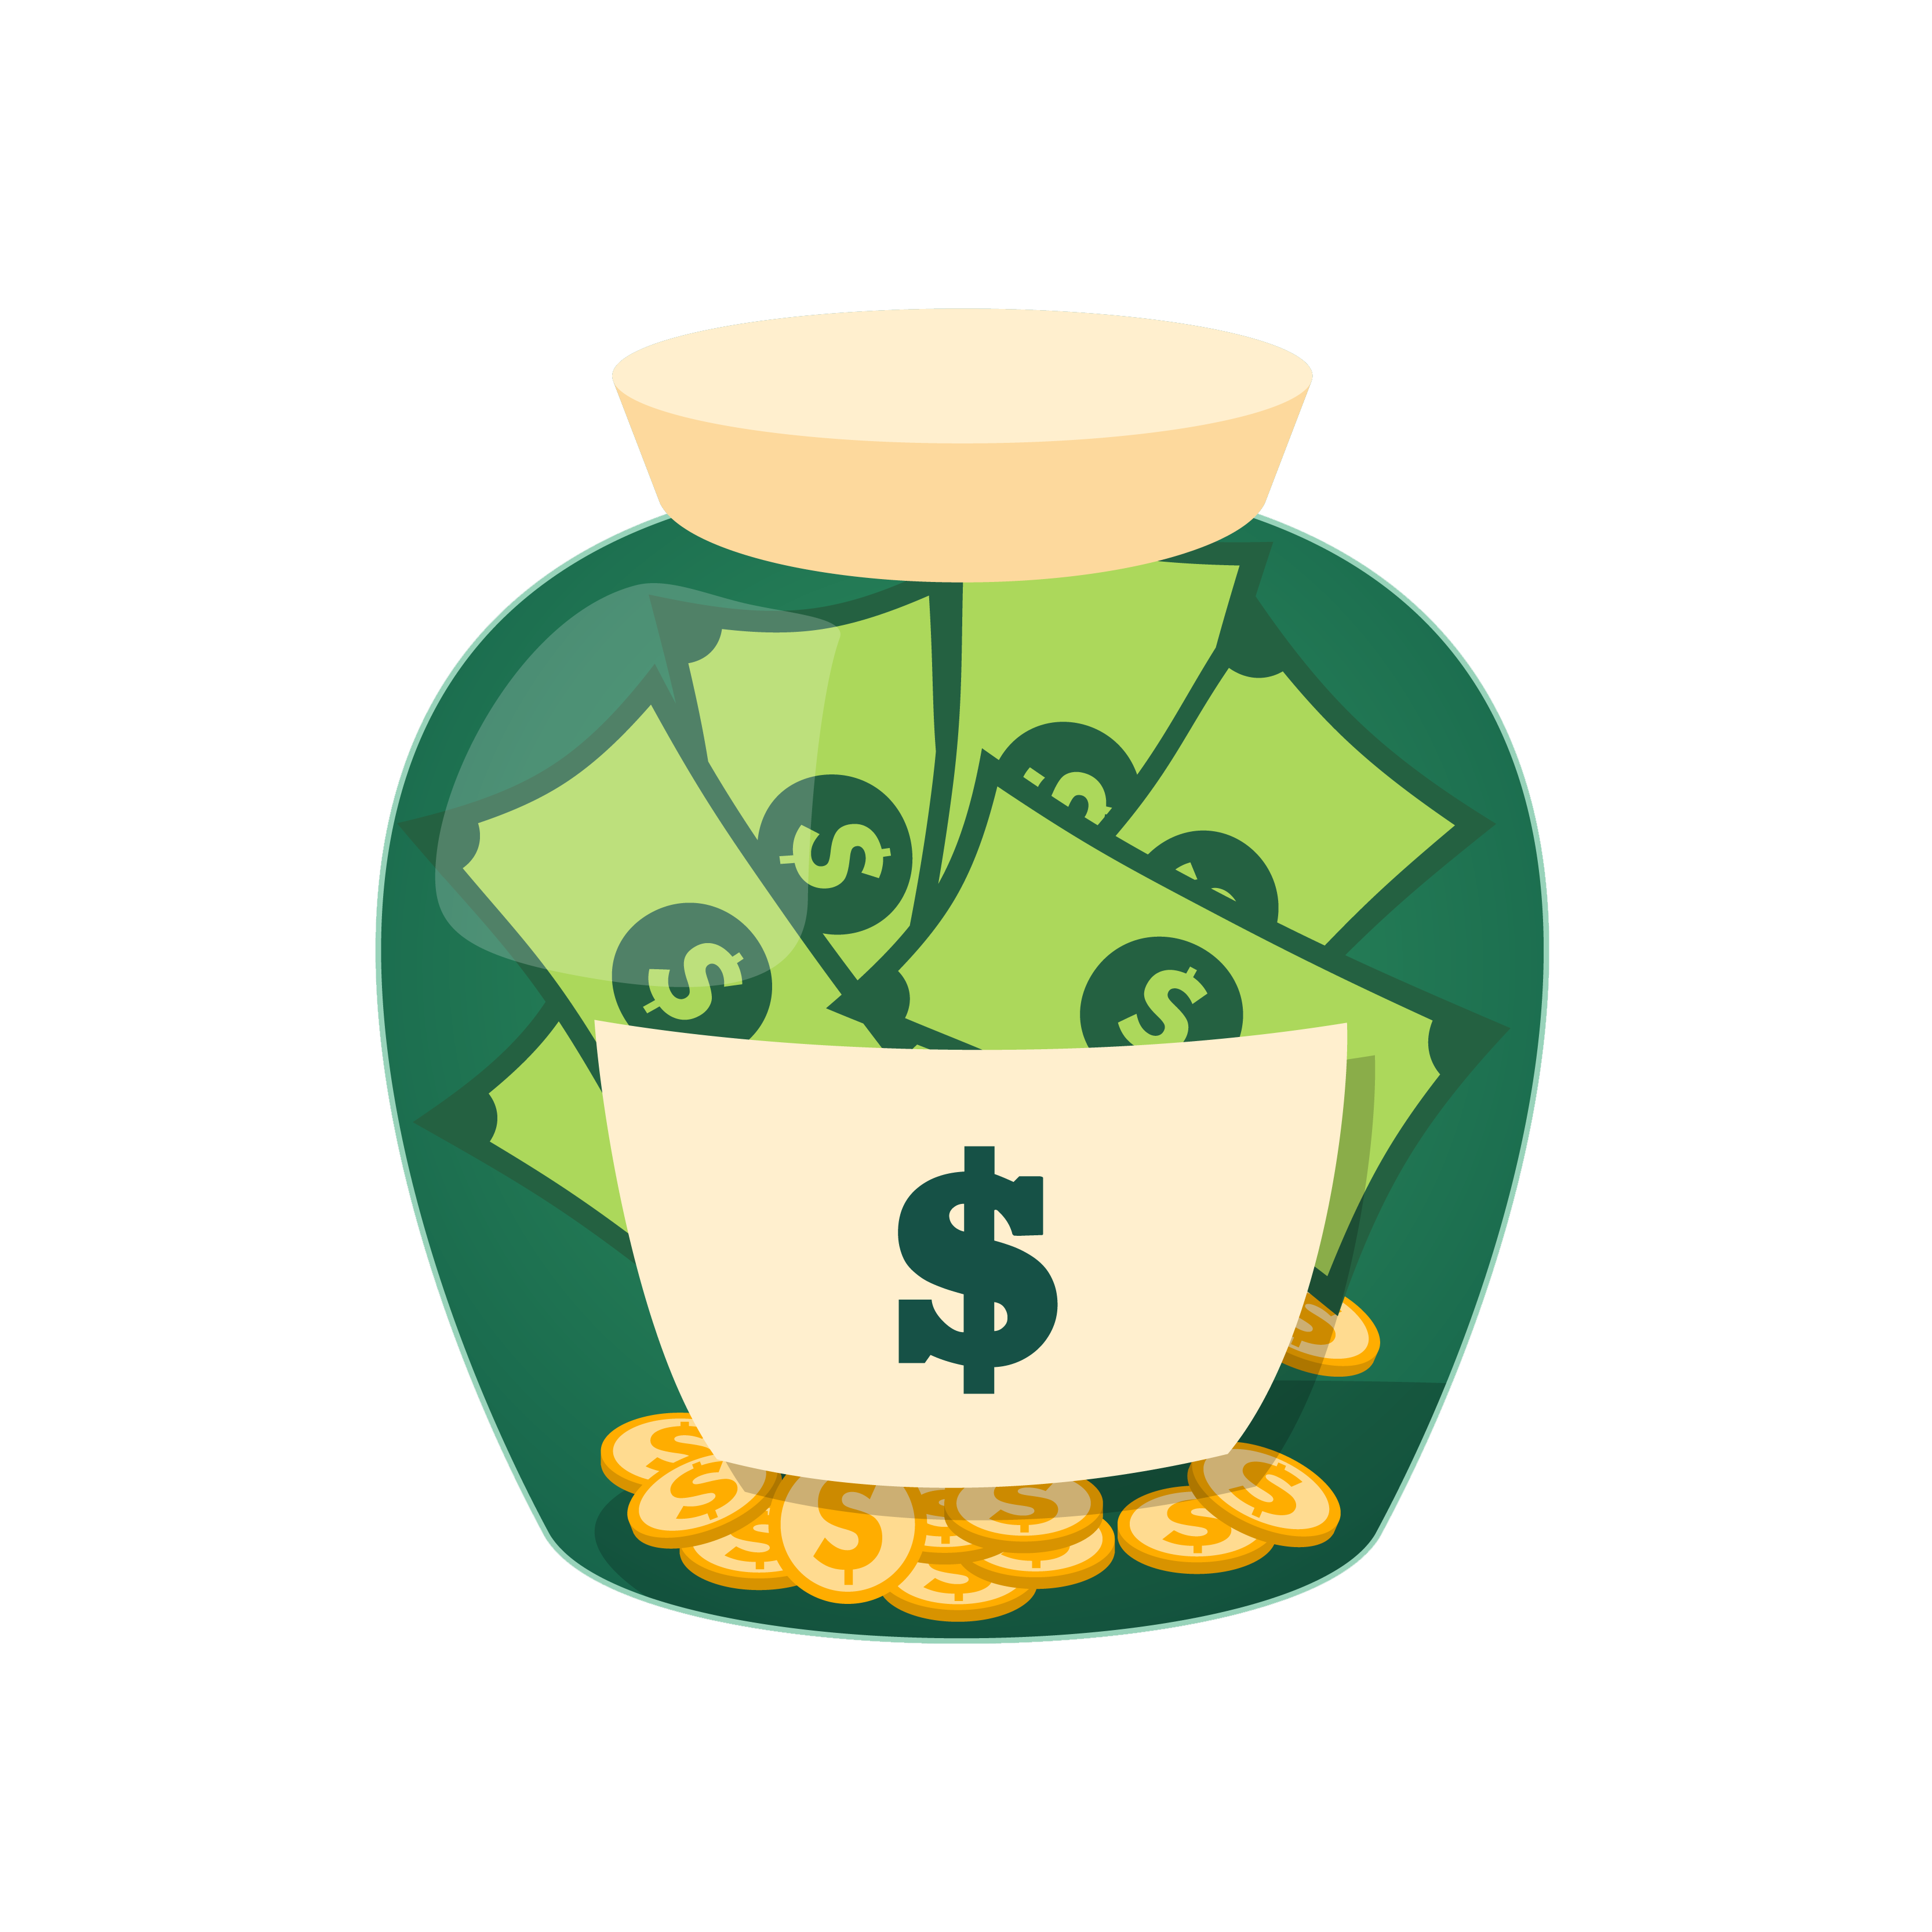 Clipart cup green coffee. Money jar saving clip